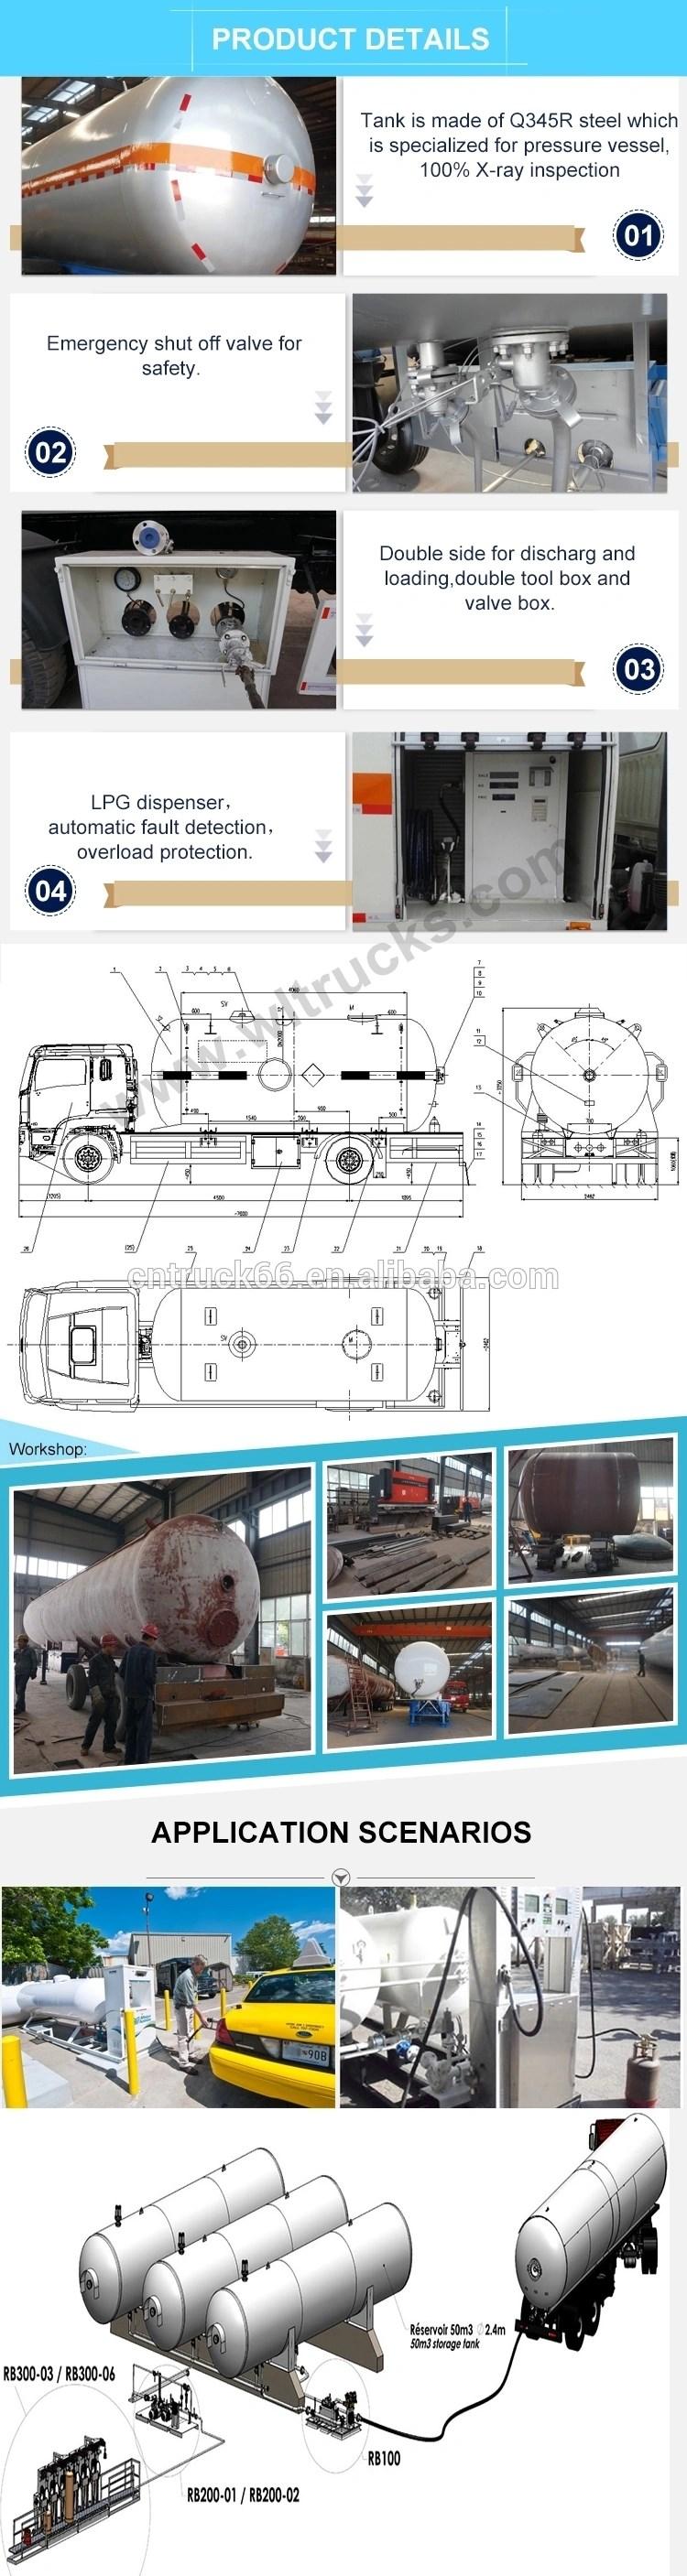 lpg truck details